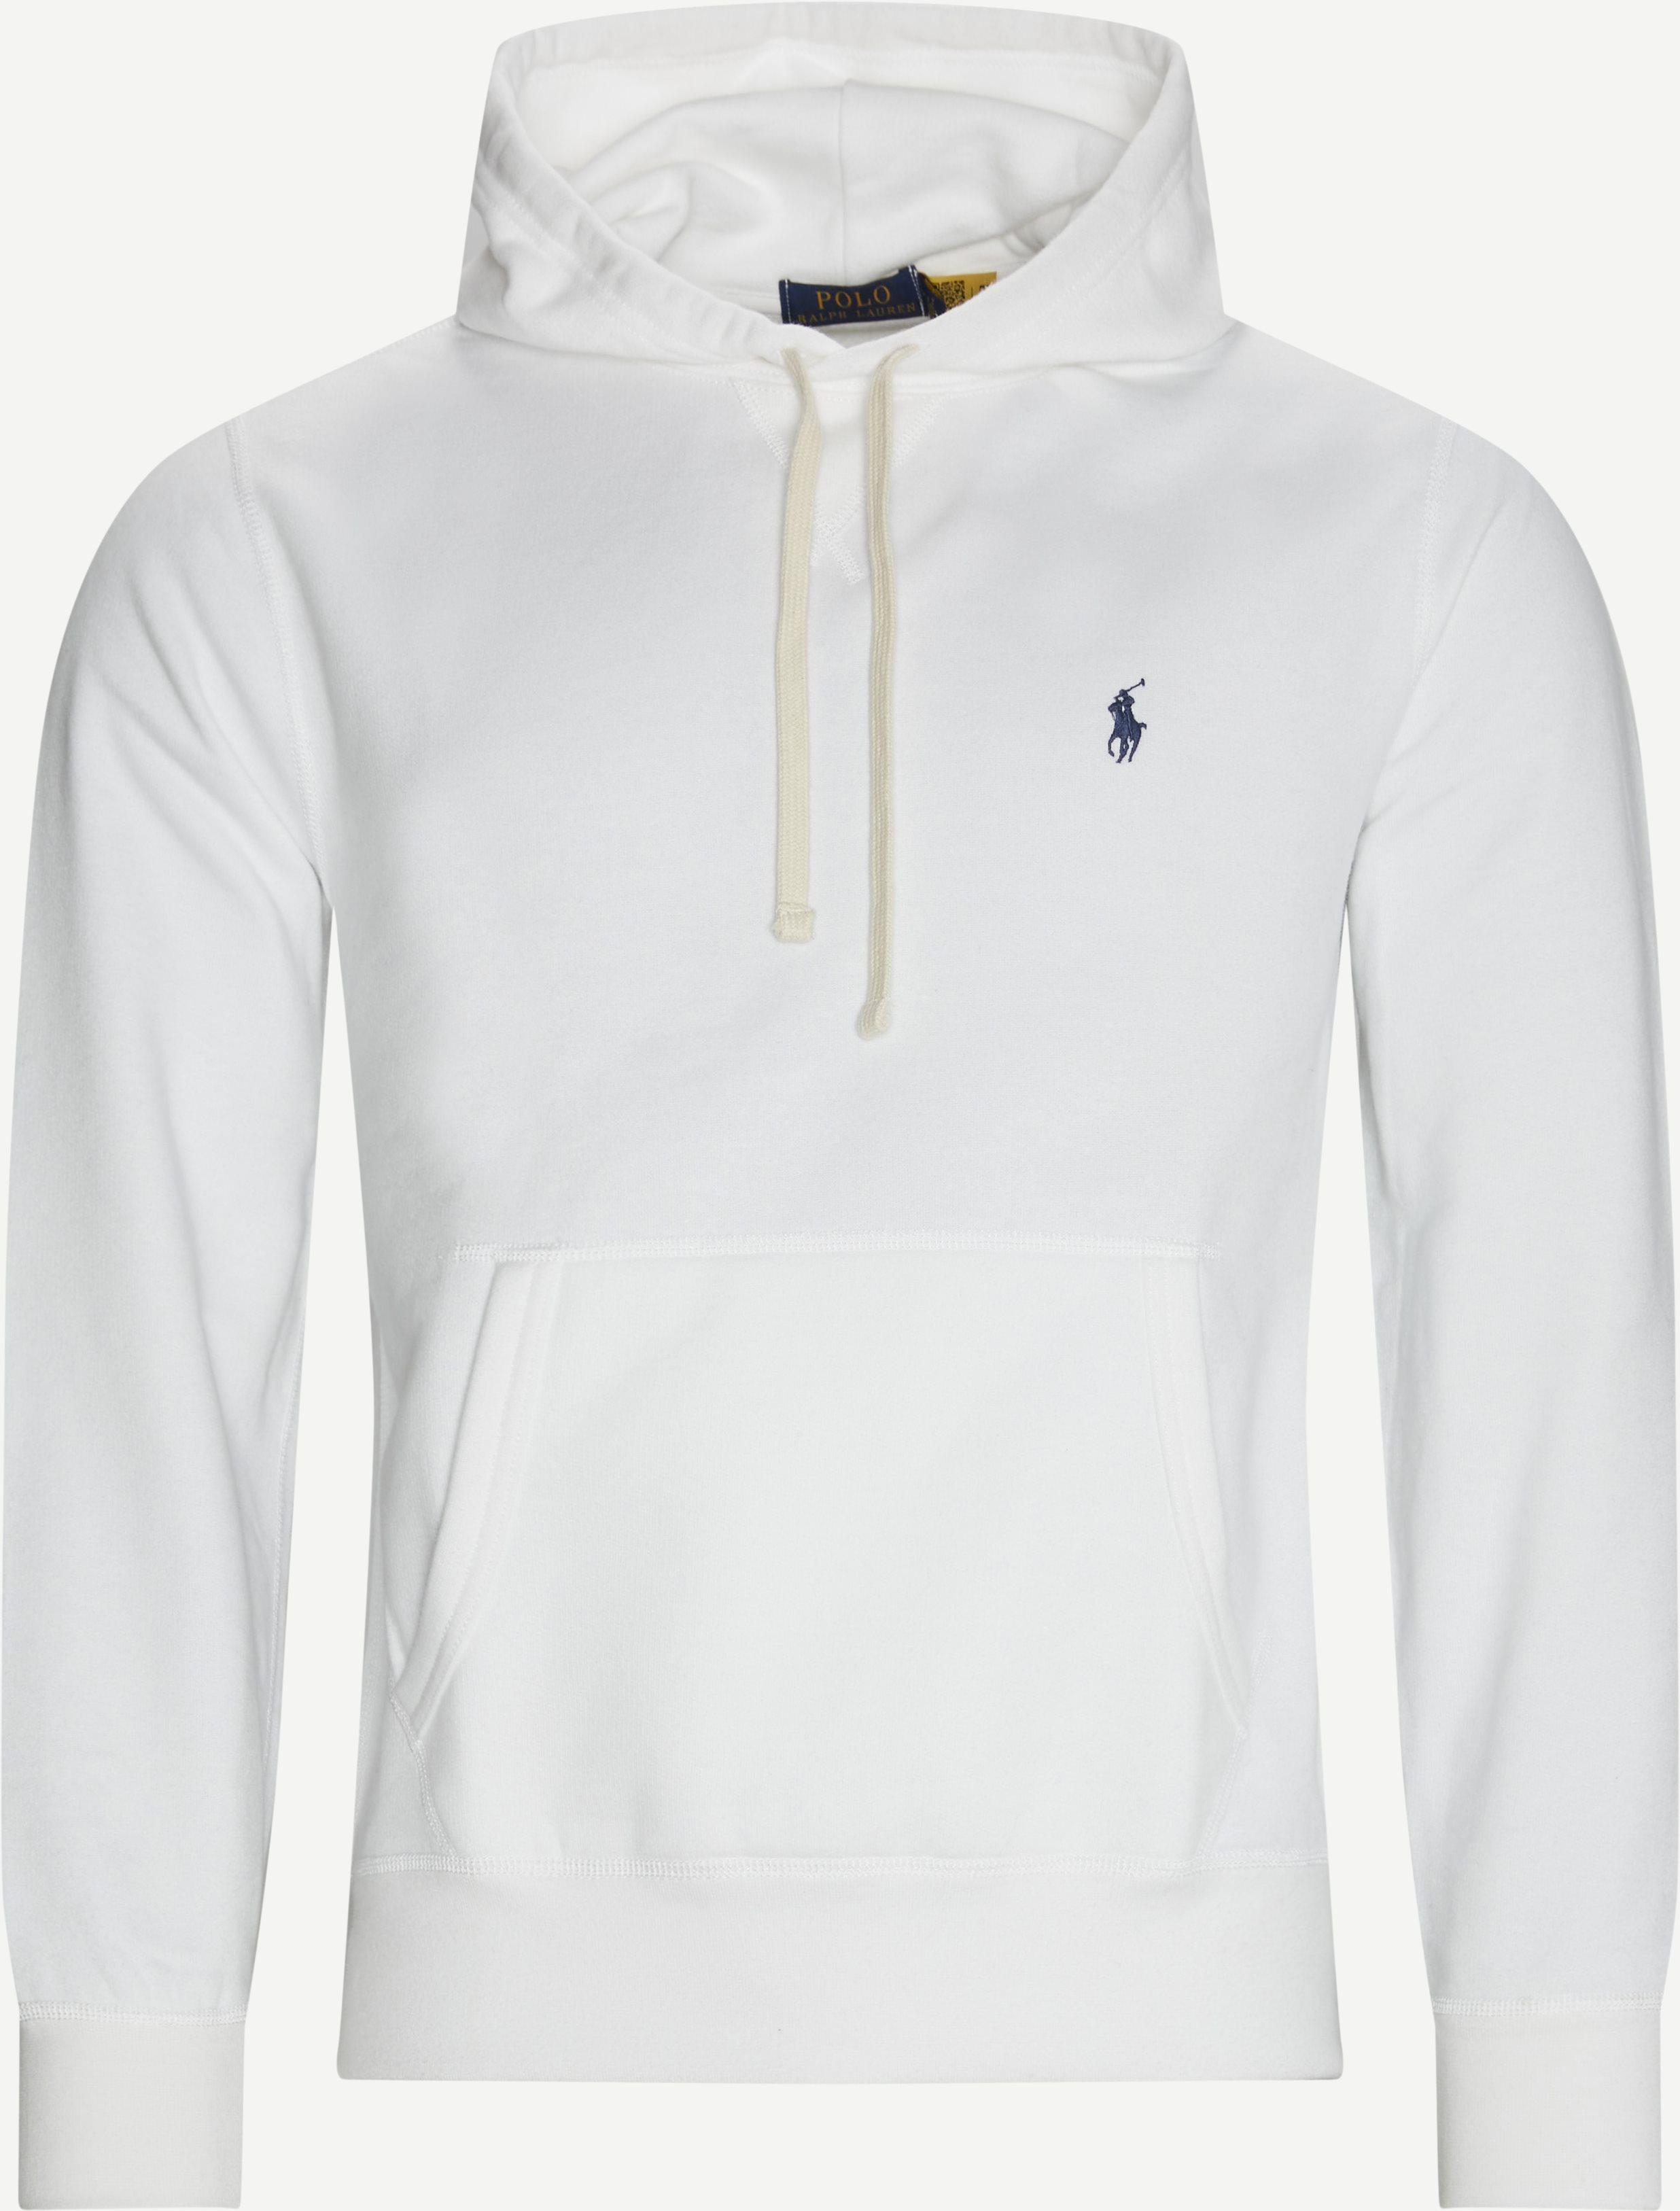 Hooded Sweatshirt - Sweatshirts - Regular fit - White